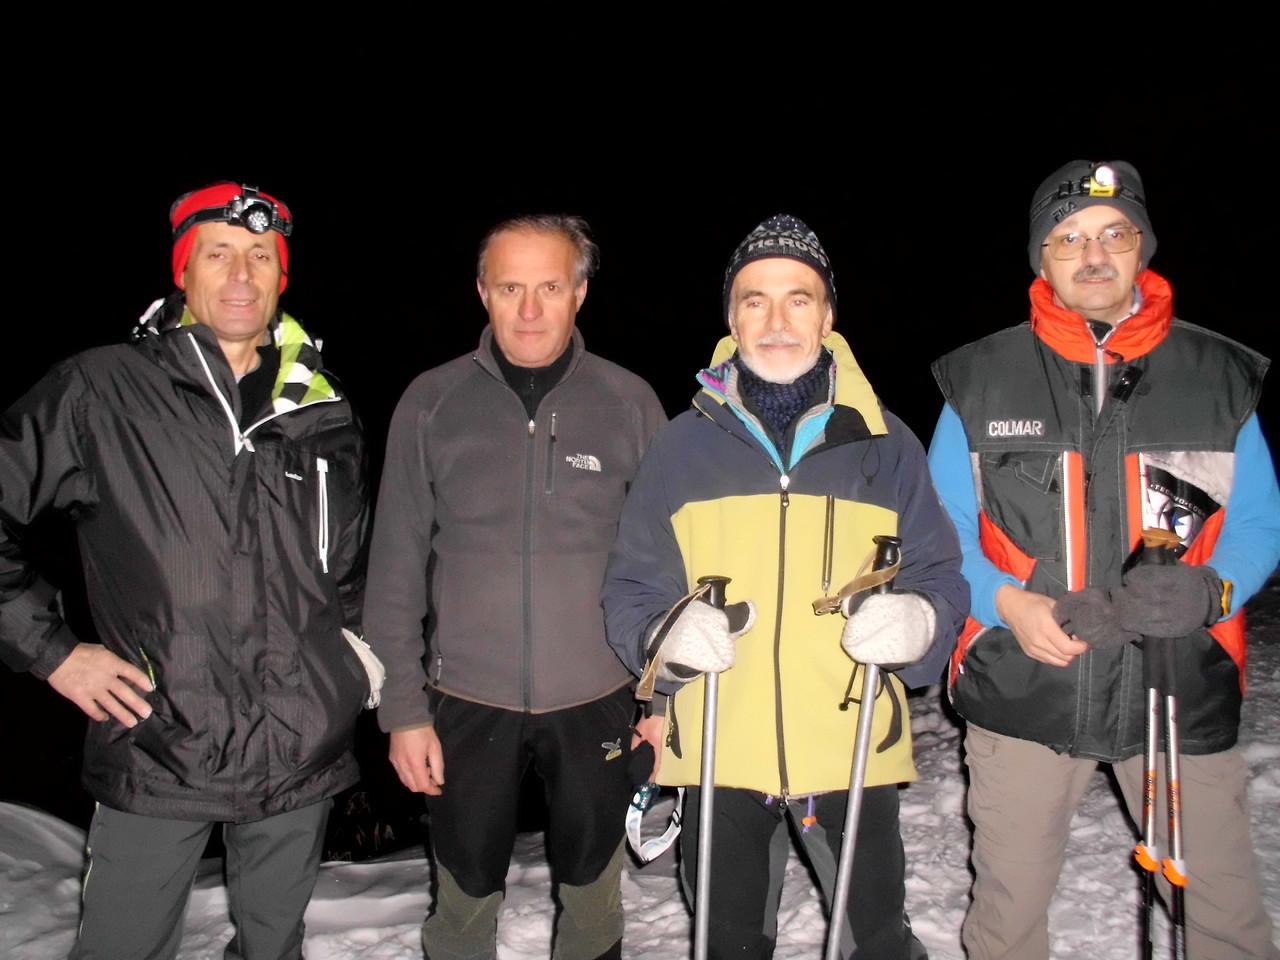 Armando, Sandro, Vittorio e Gianni baffo